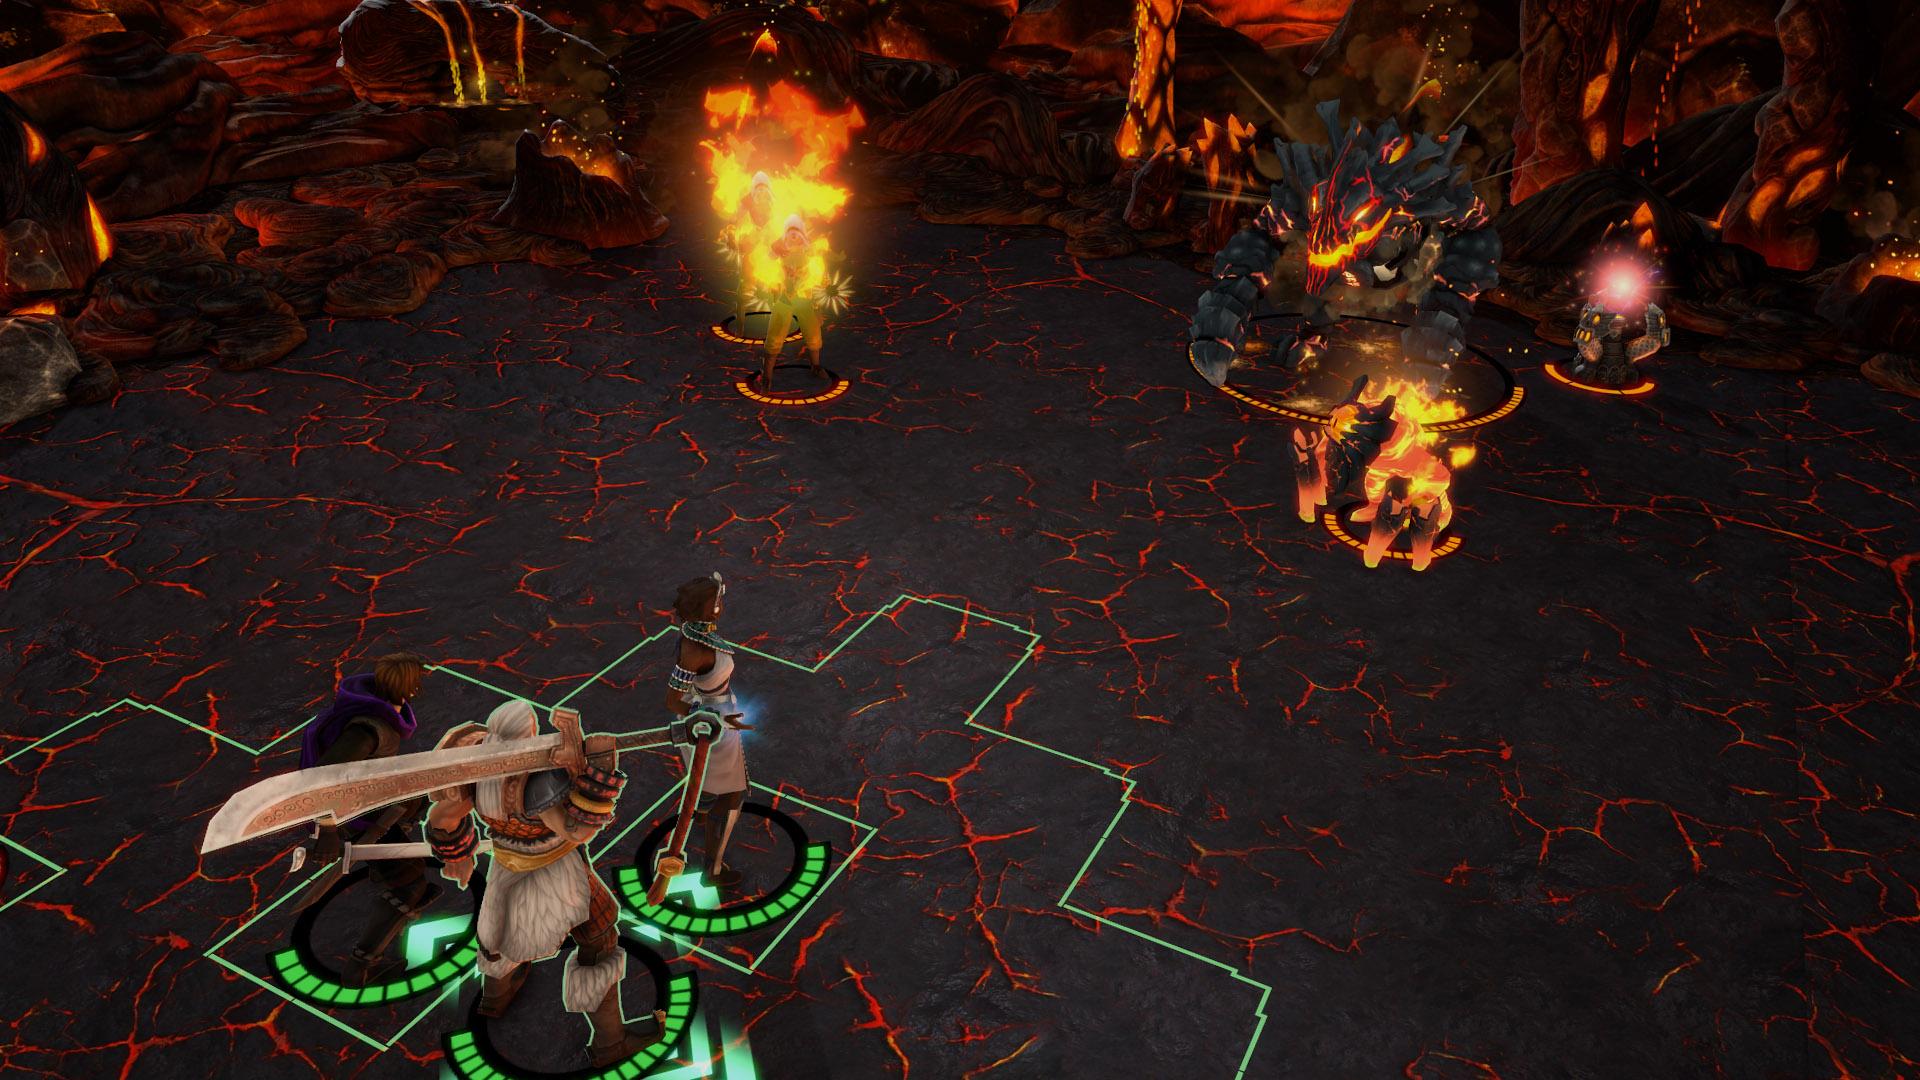 Redesigned Roggix, Flame Incarnate's Labyrinth